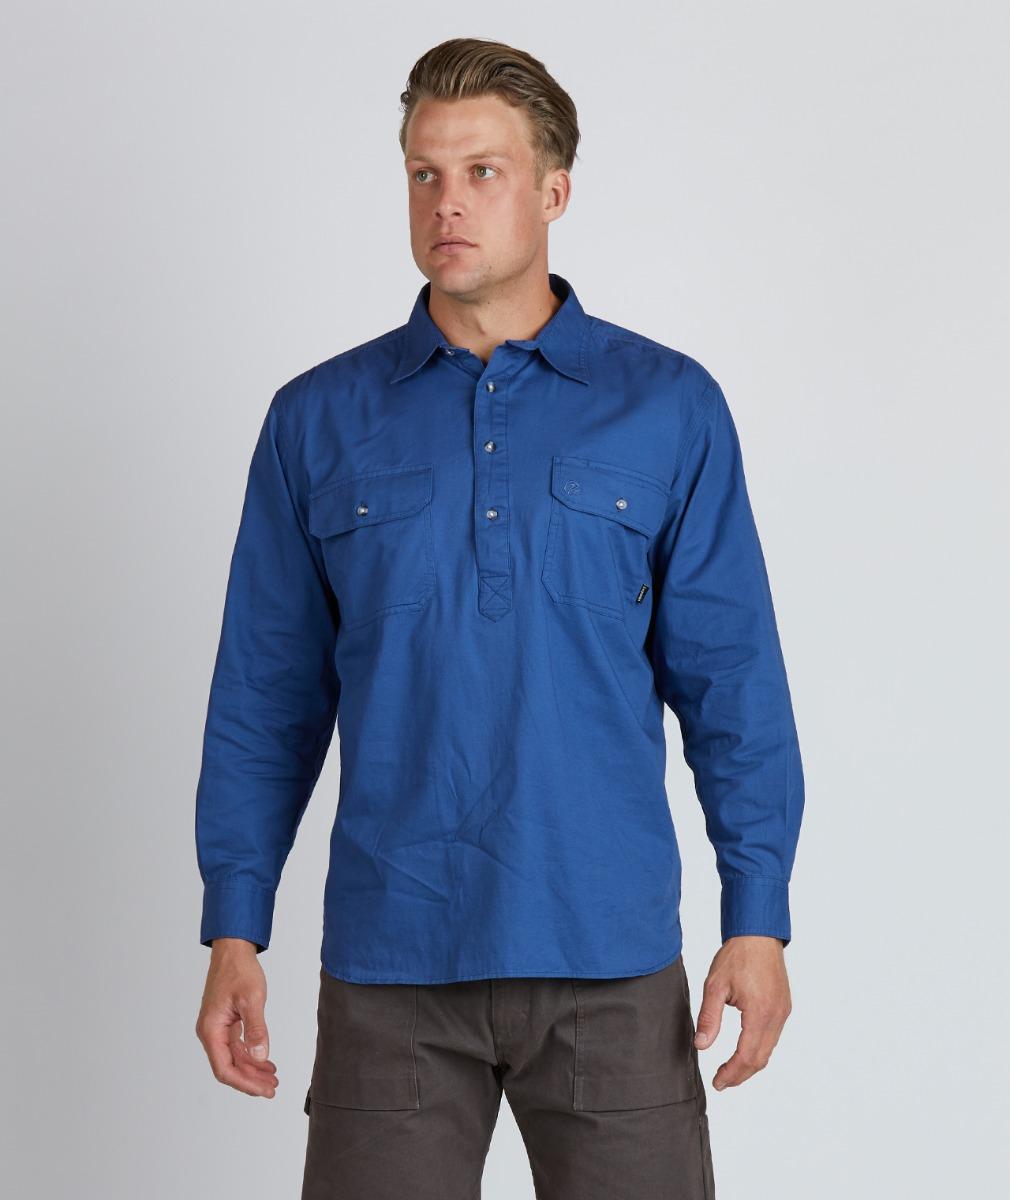 Bendigo Work Shirt